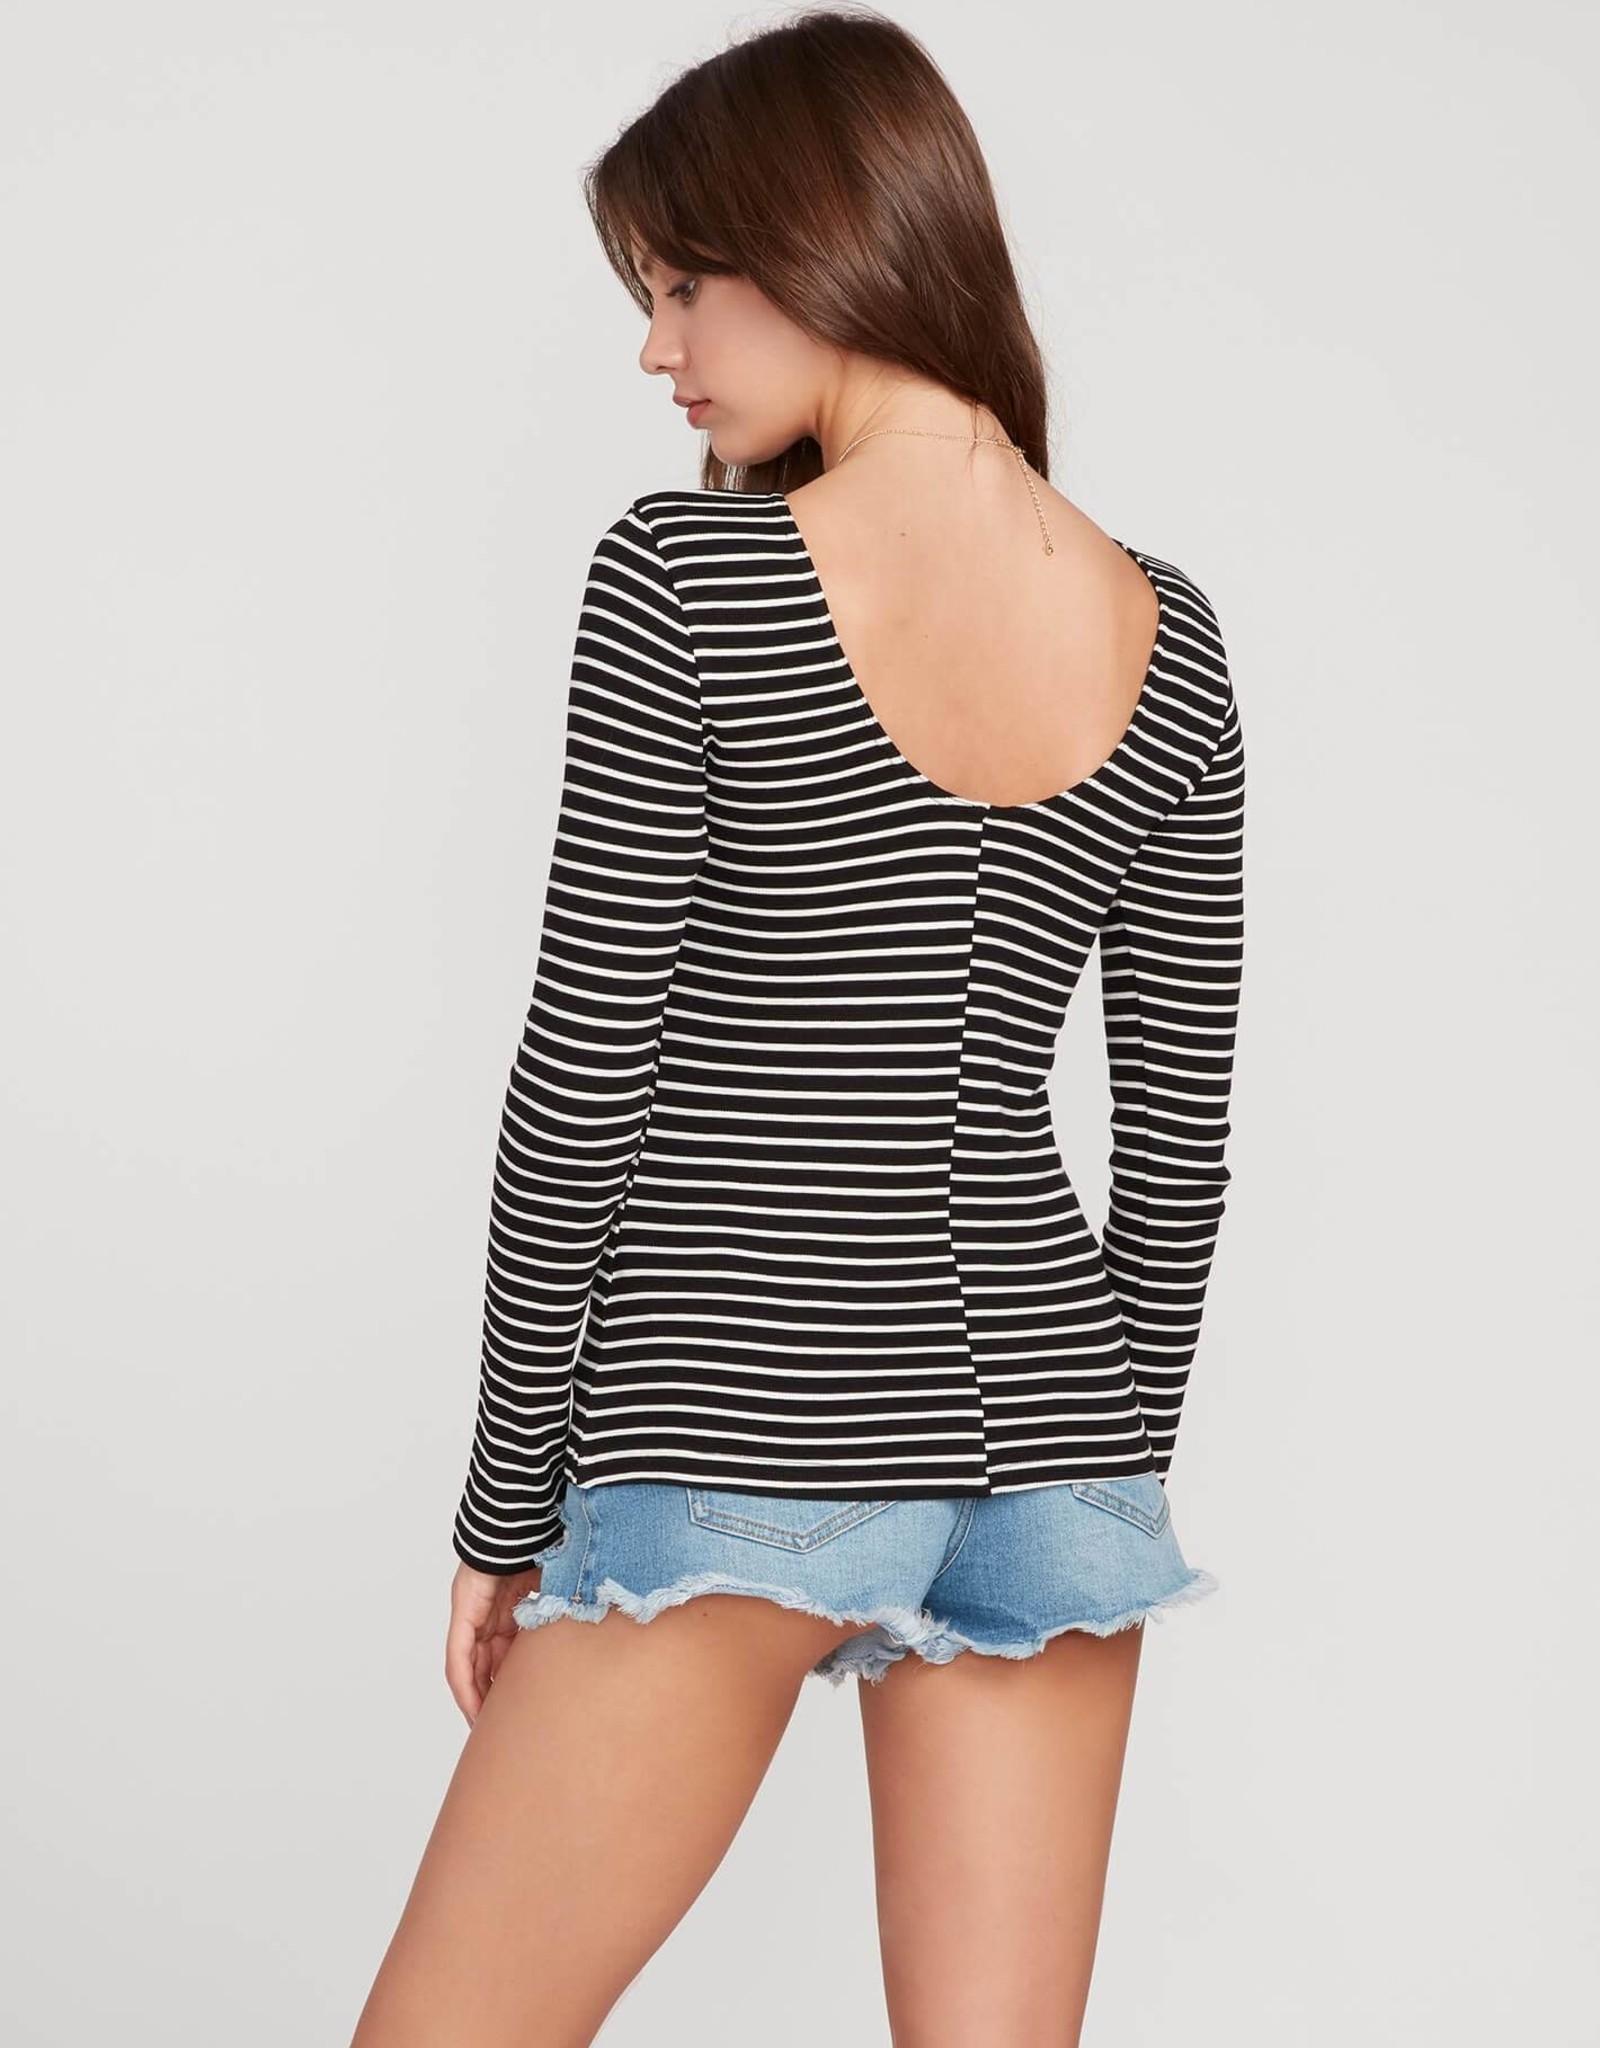 Volcom Long Sleeve Stripe Top